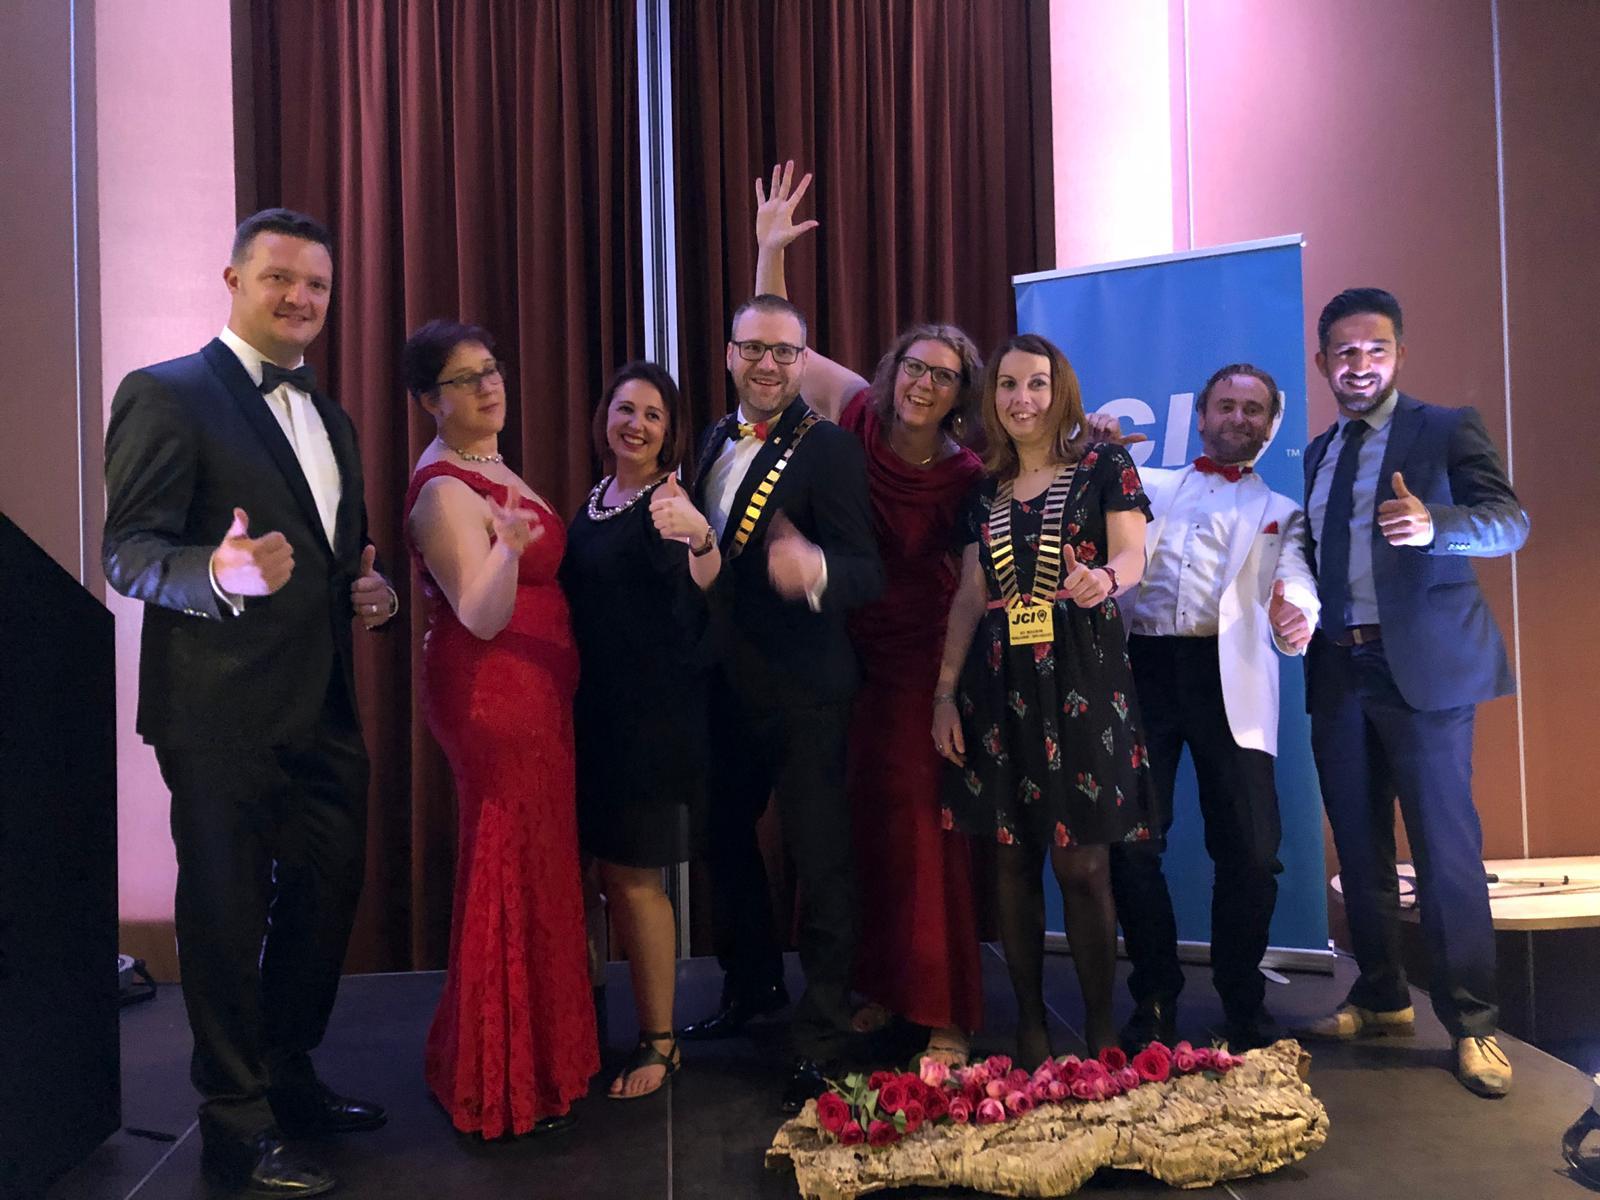 Board JCI Belgium 2019